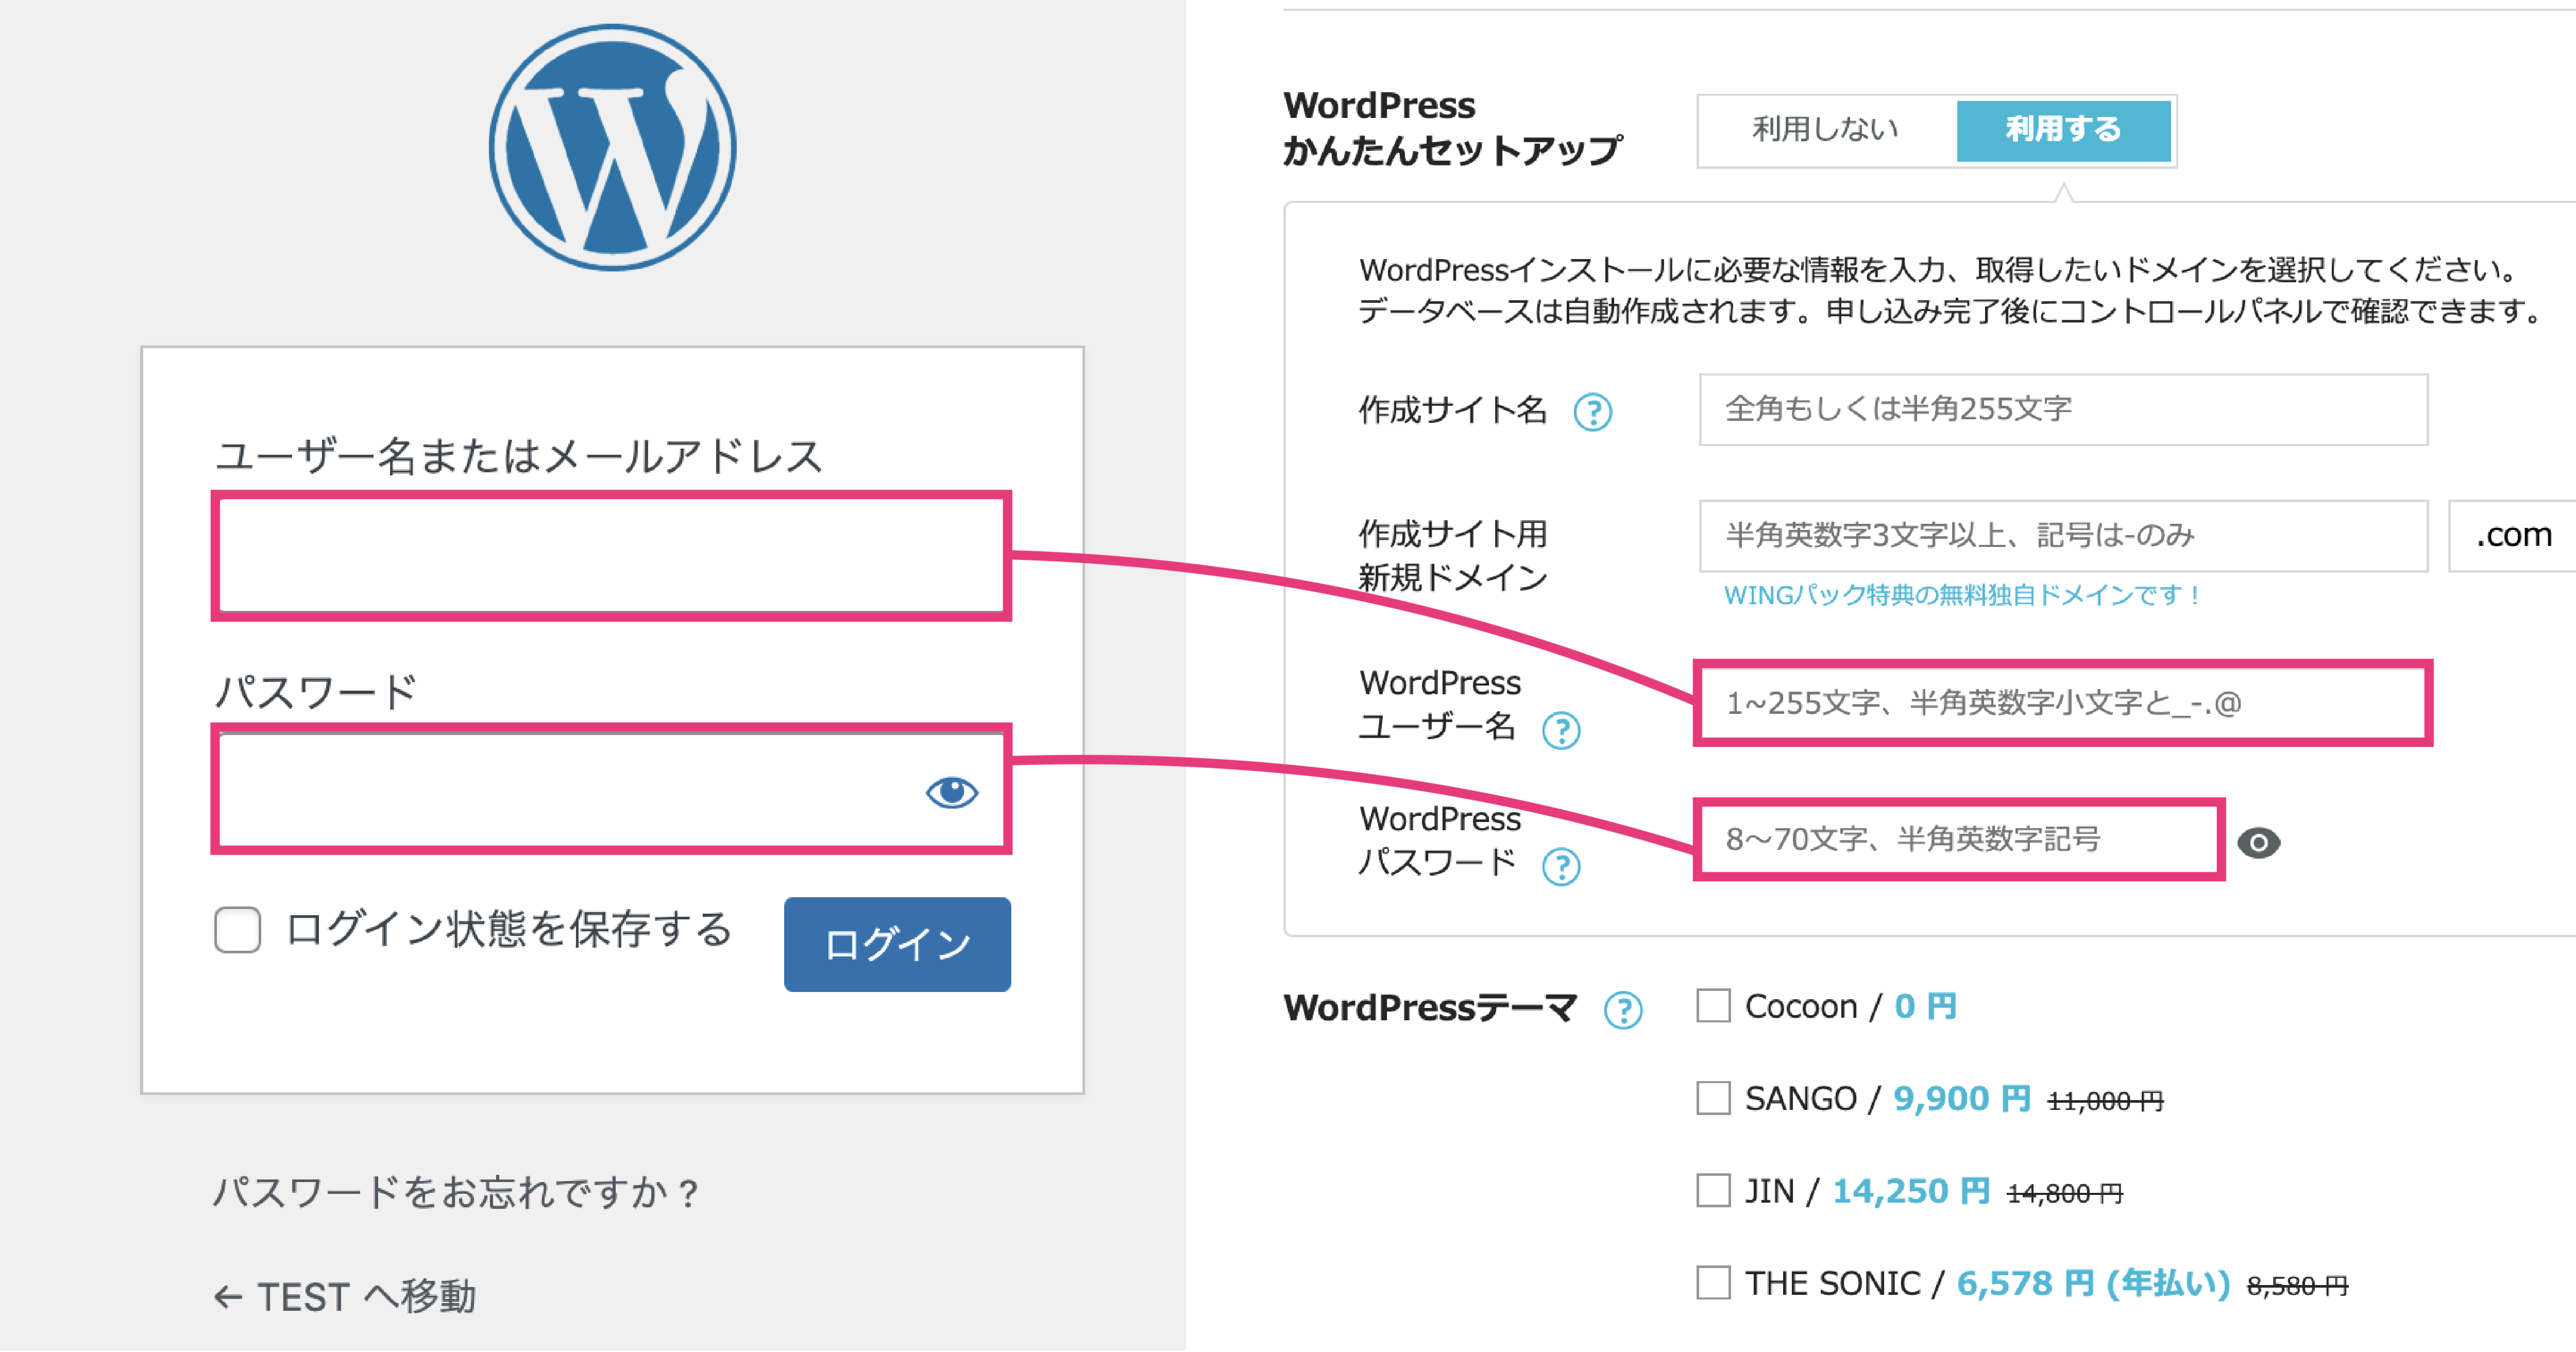 WordPressのログイン情報